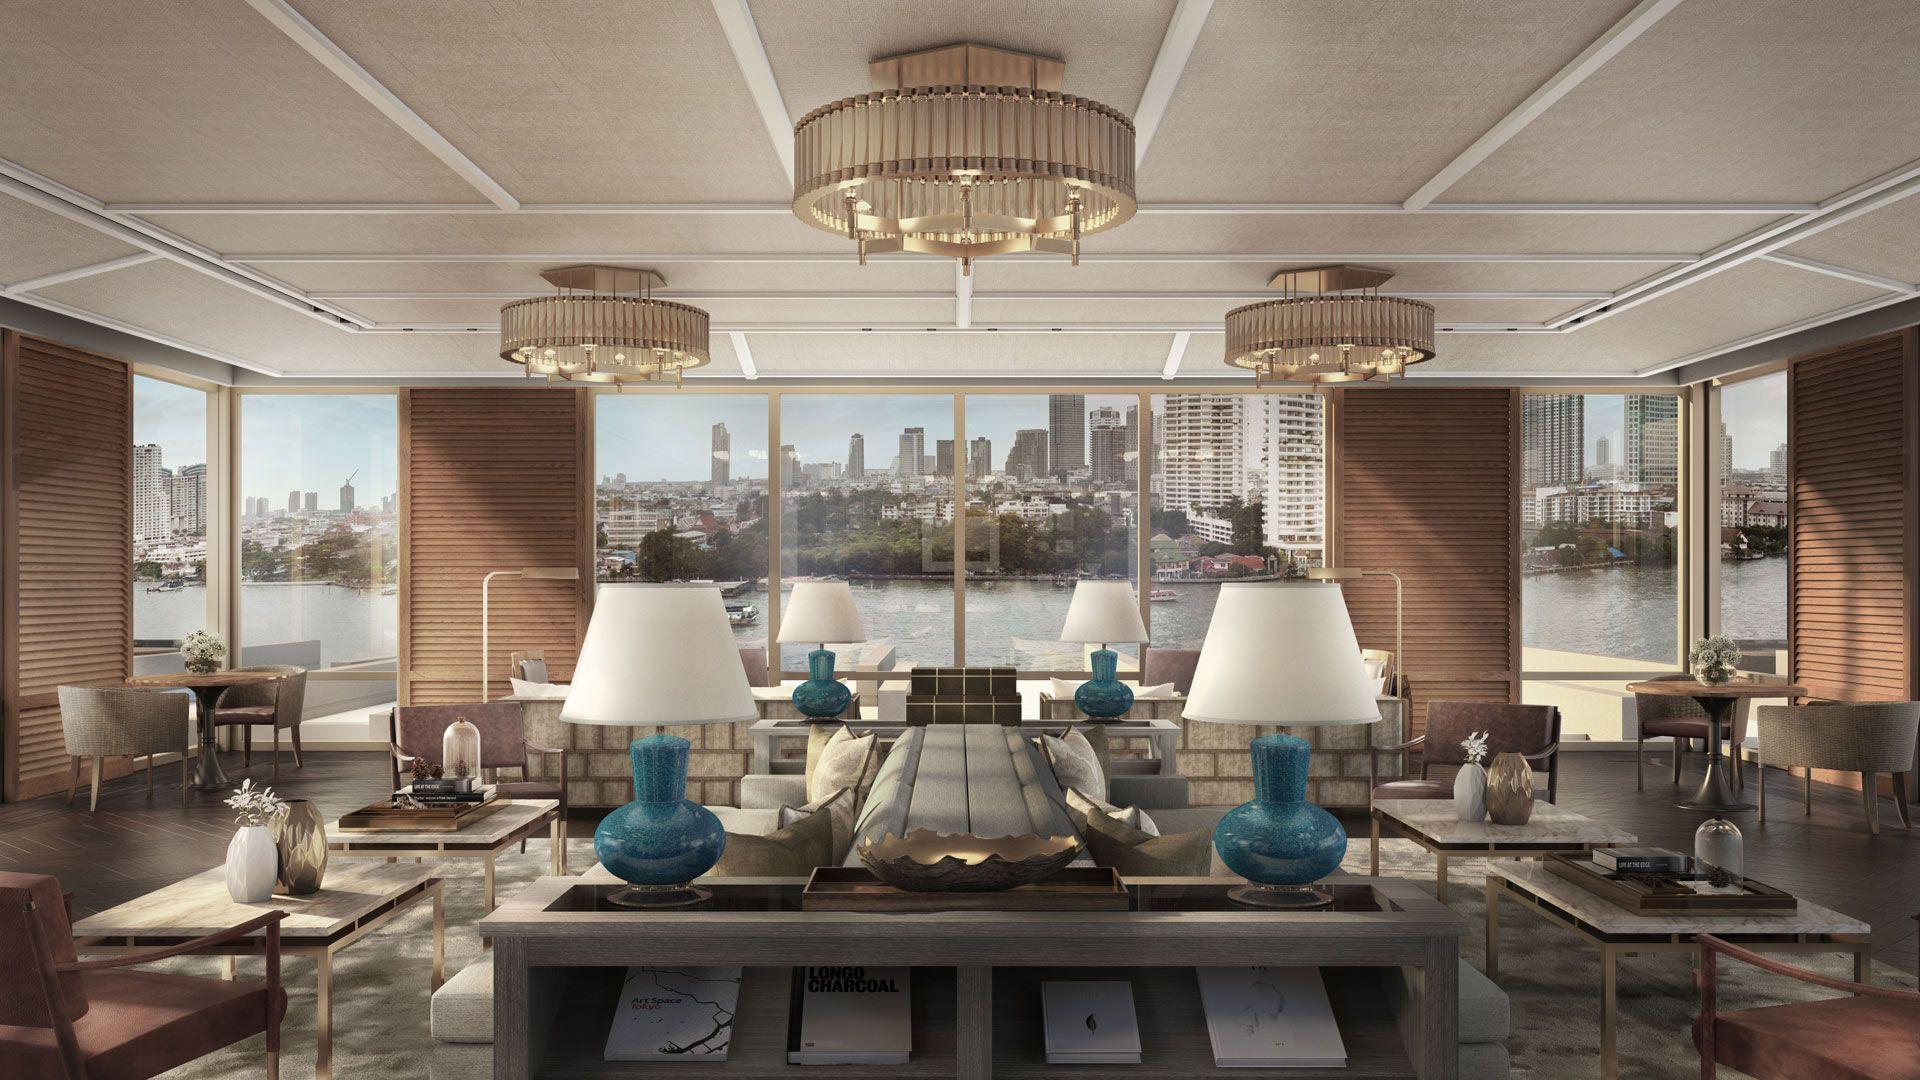 Bangkok Beckons: New Luxury Hotels In The Thai Capital